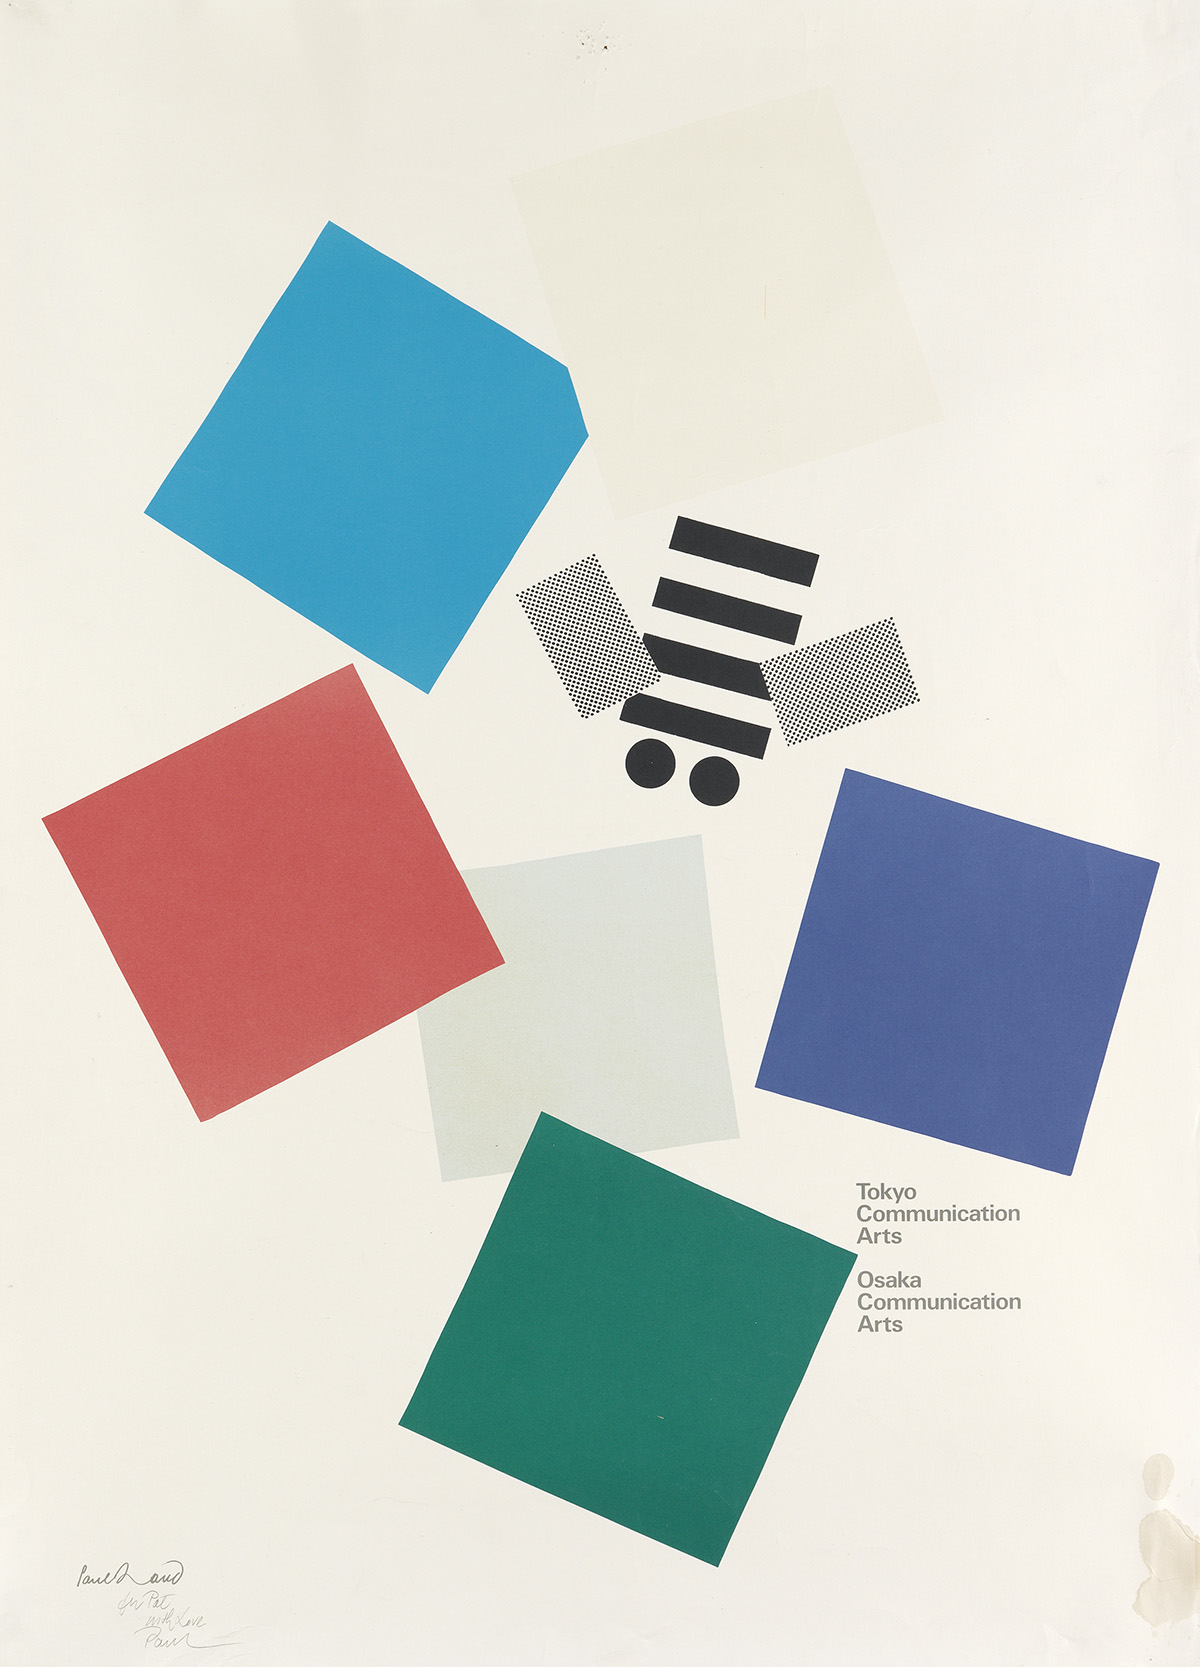 PAUL-RAND-(1914-1996)-TOKYO-COMMUNICATION-ARTS-1991-35x25-in